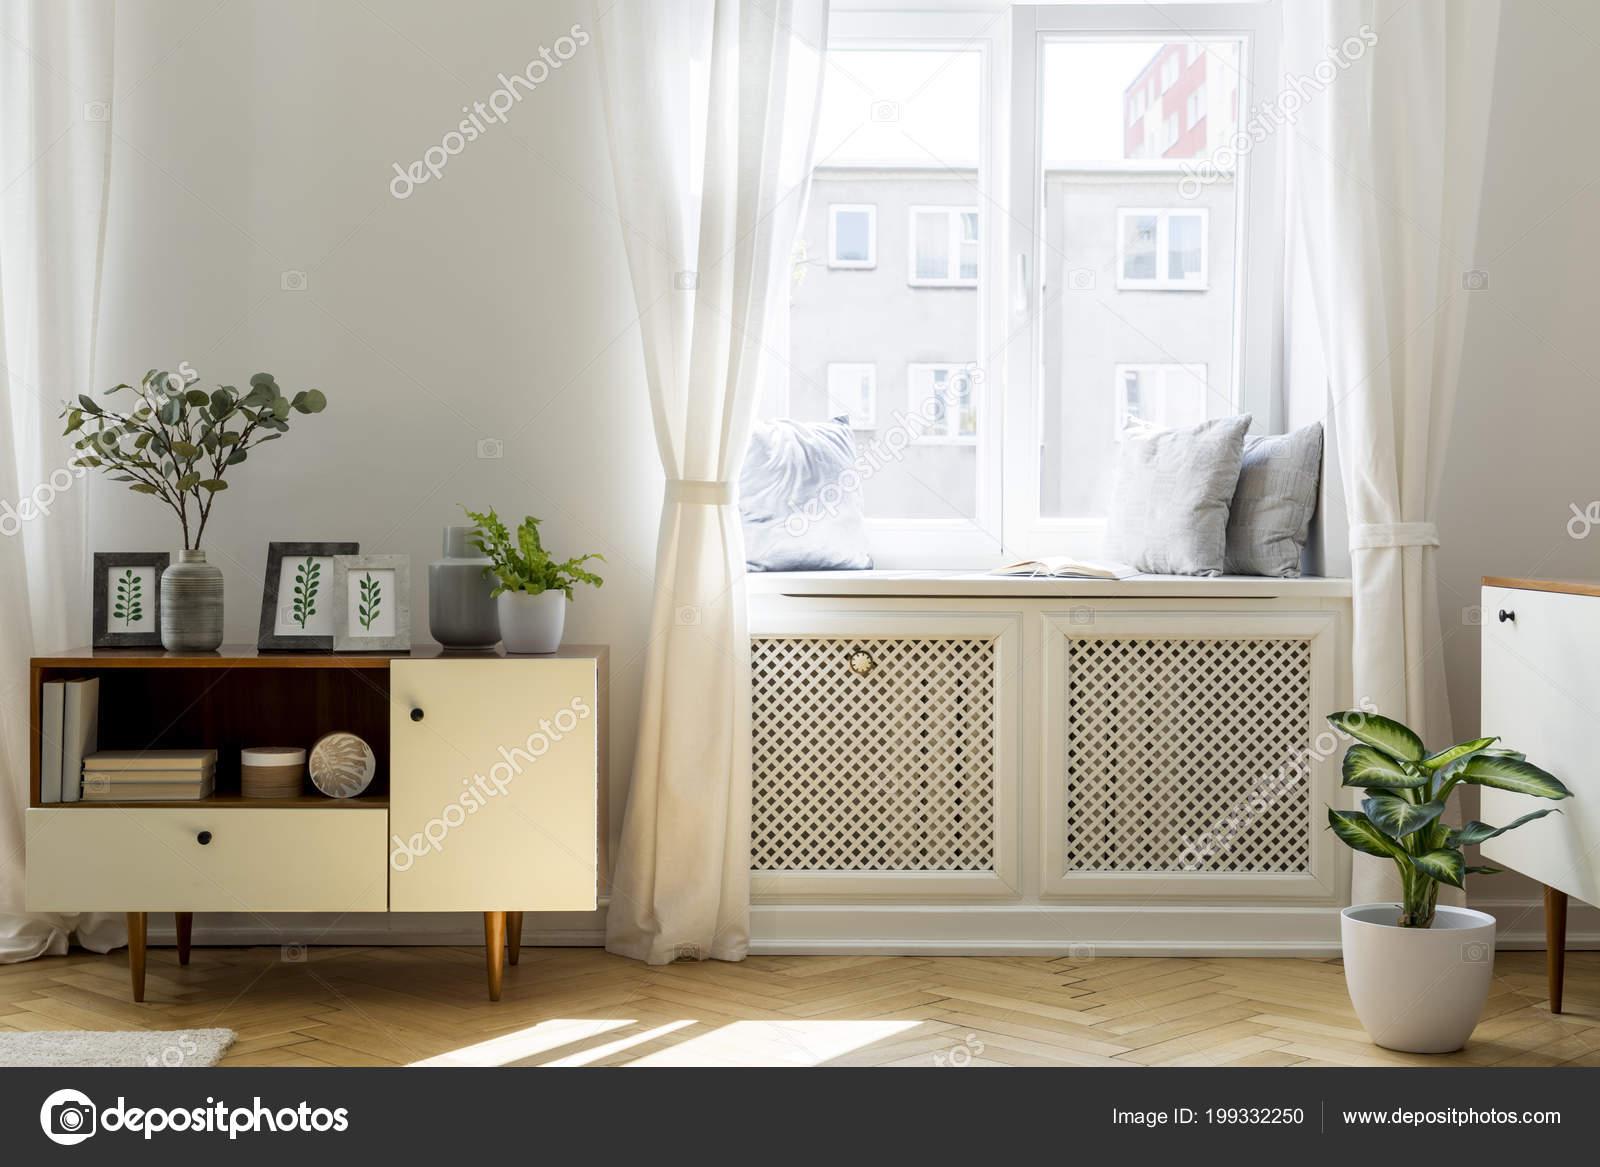 Plant houten kast witte woonkamer interieur met venster echte foto